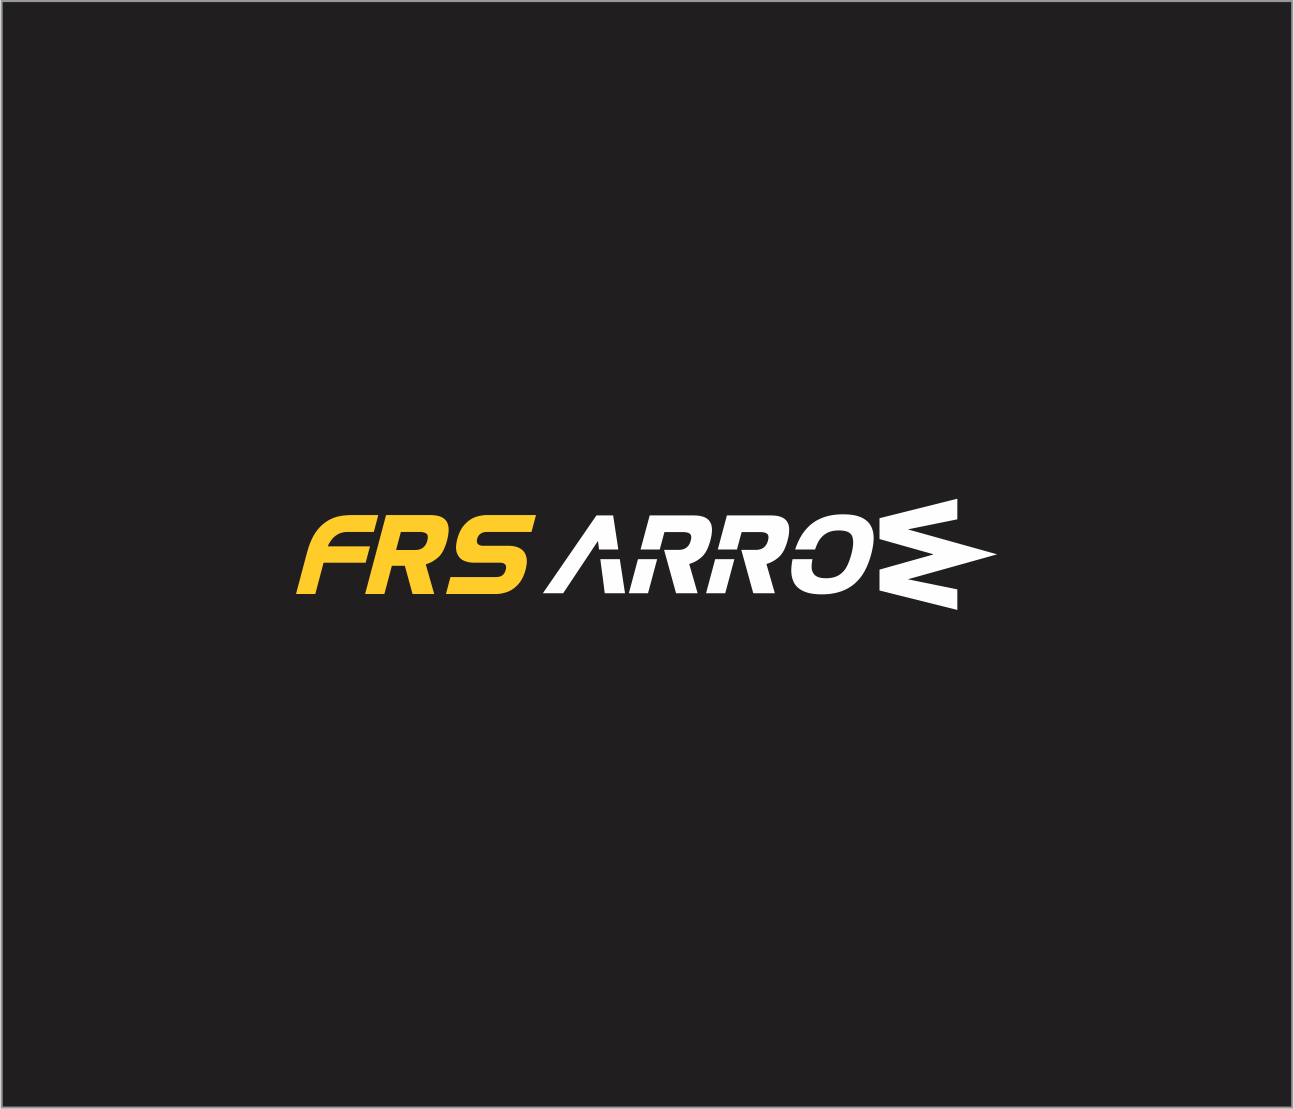 Logo Design by Armada Jamaluddin - Entry No. 113 in the Logo Design Contest Fun Logo Design for FRS.